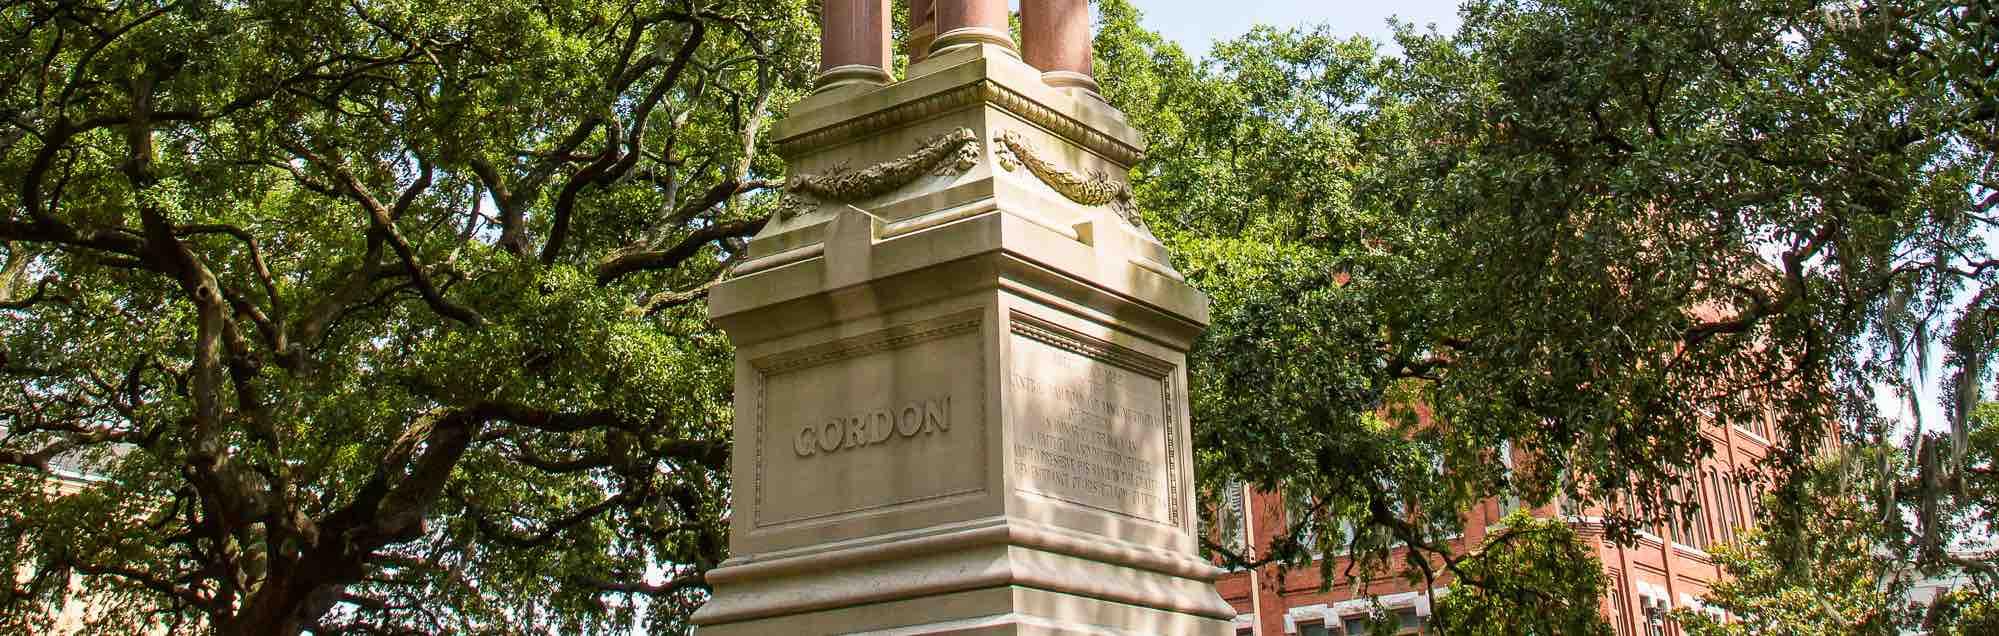 Base of the Gordon Monument in Wright Square, Savannah, GA.